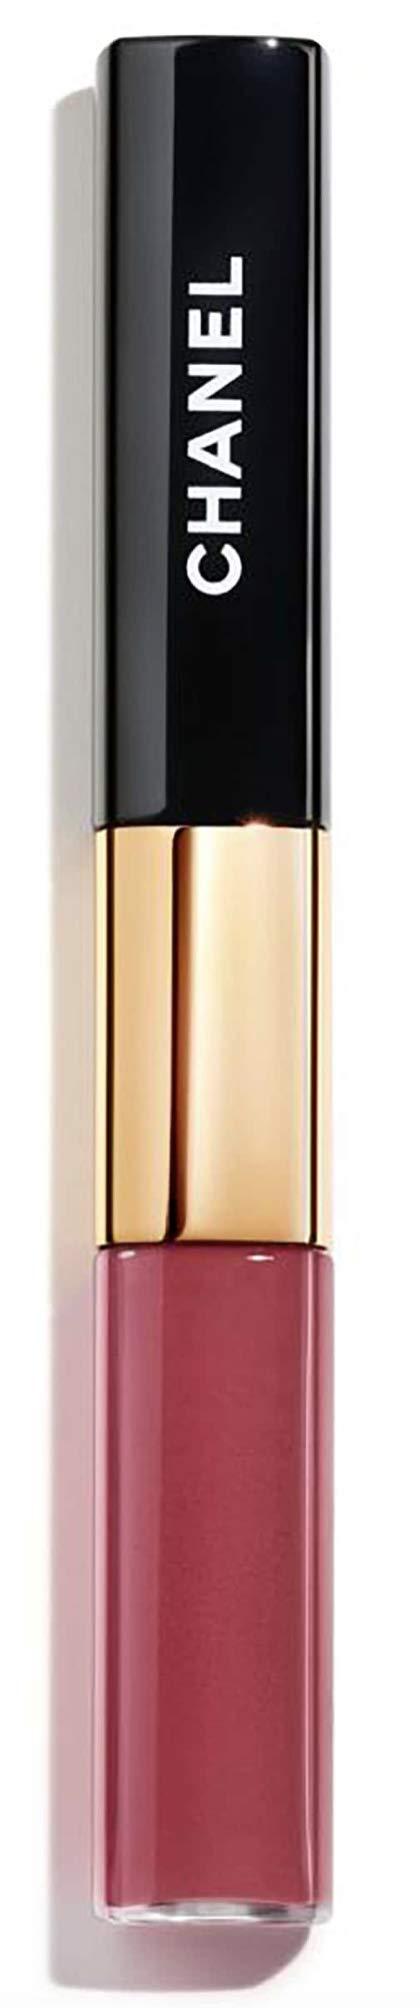 LE ROUGE DUO ULTRA TENUE Ultra Wear Lip Colour: 43 Sensual Rose by